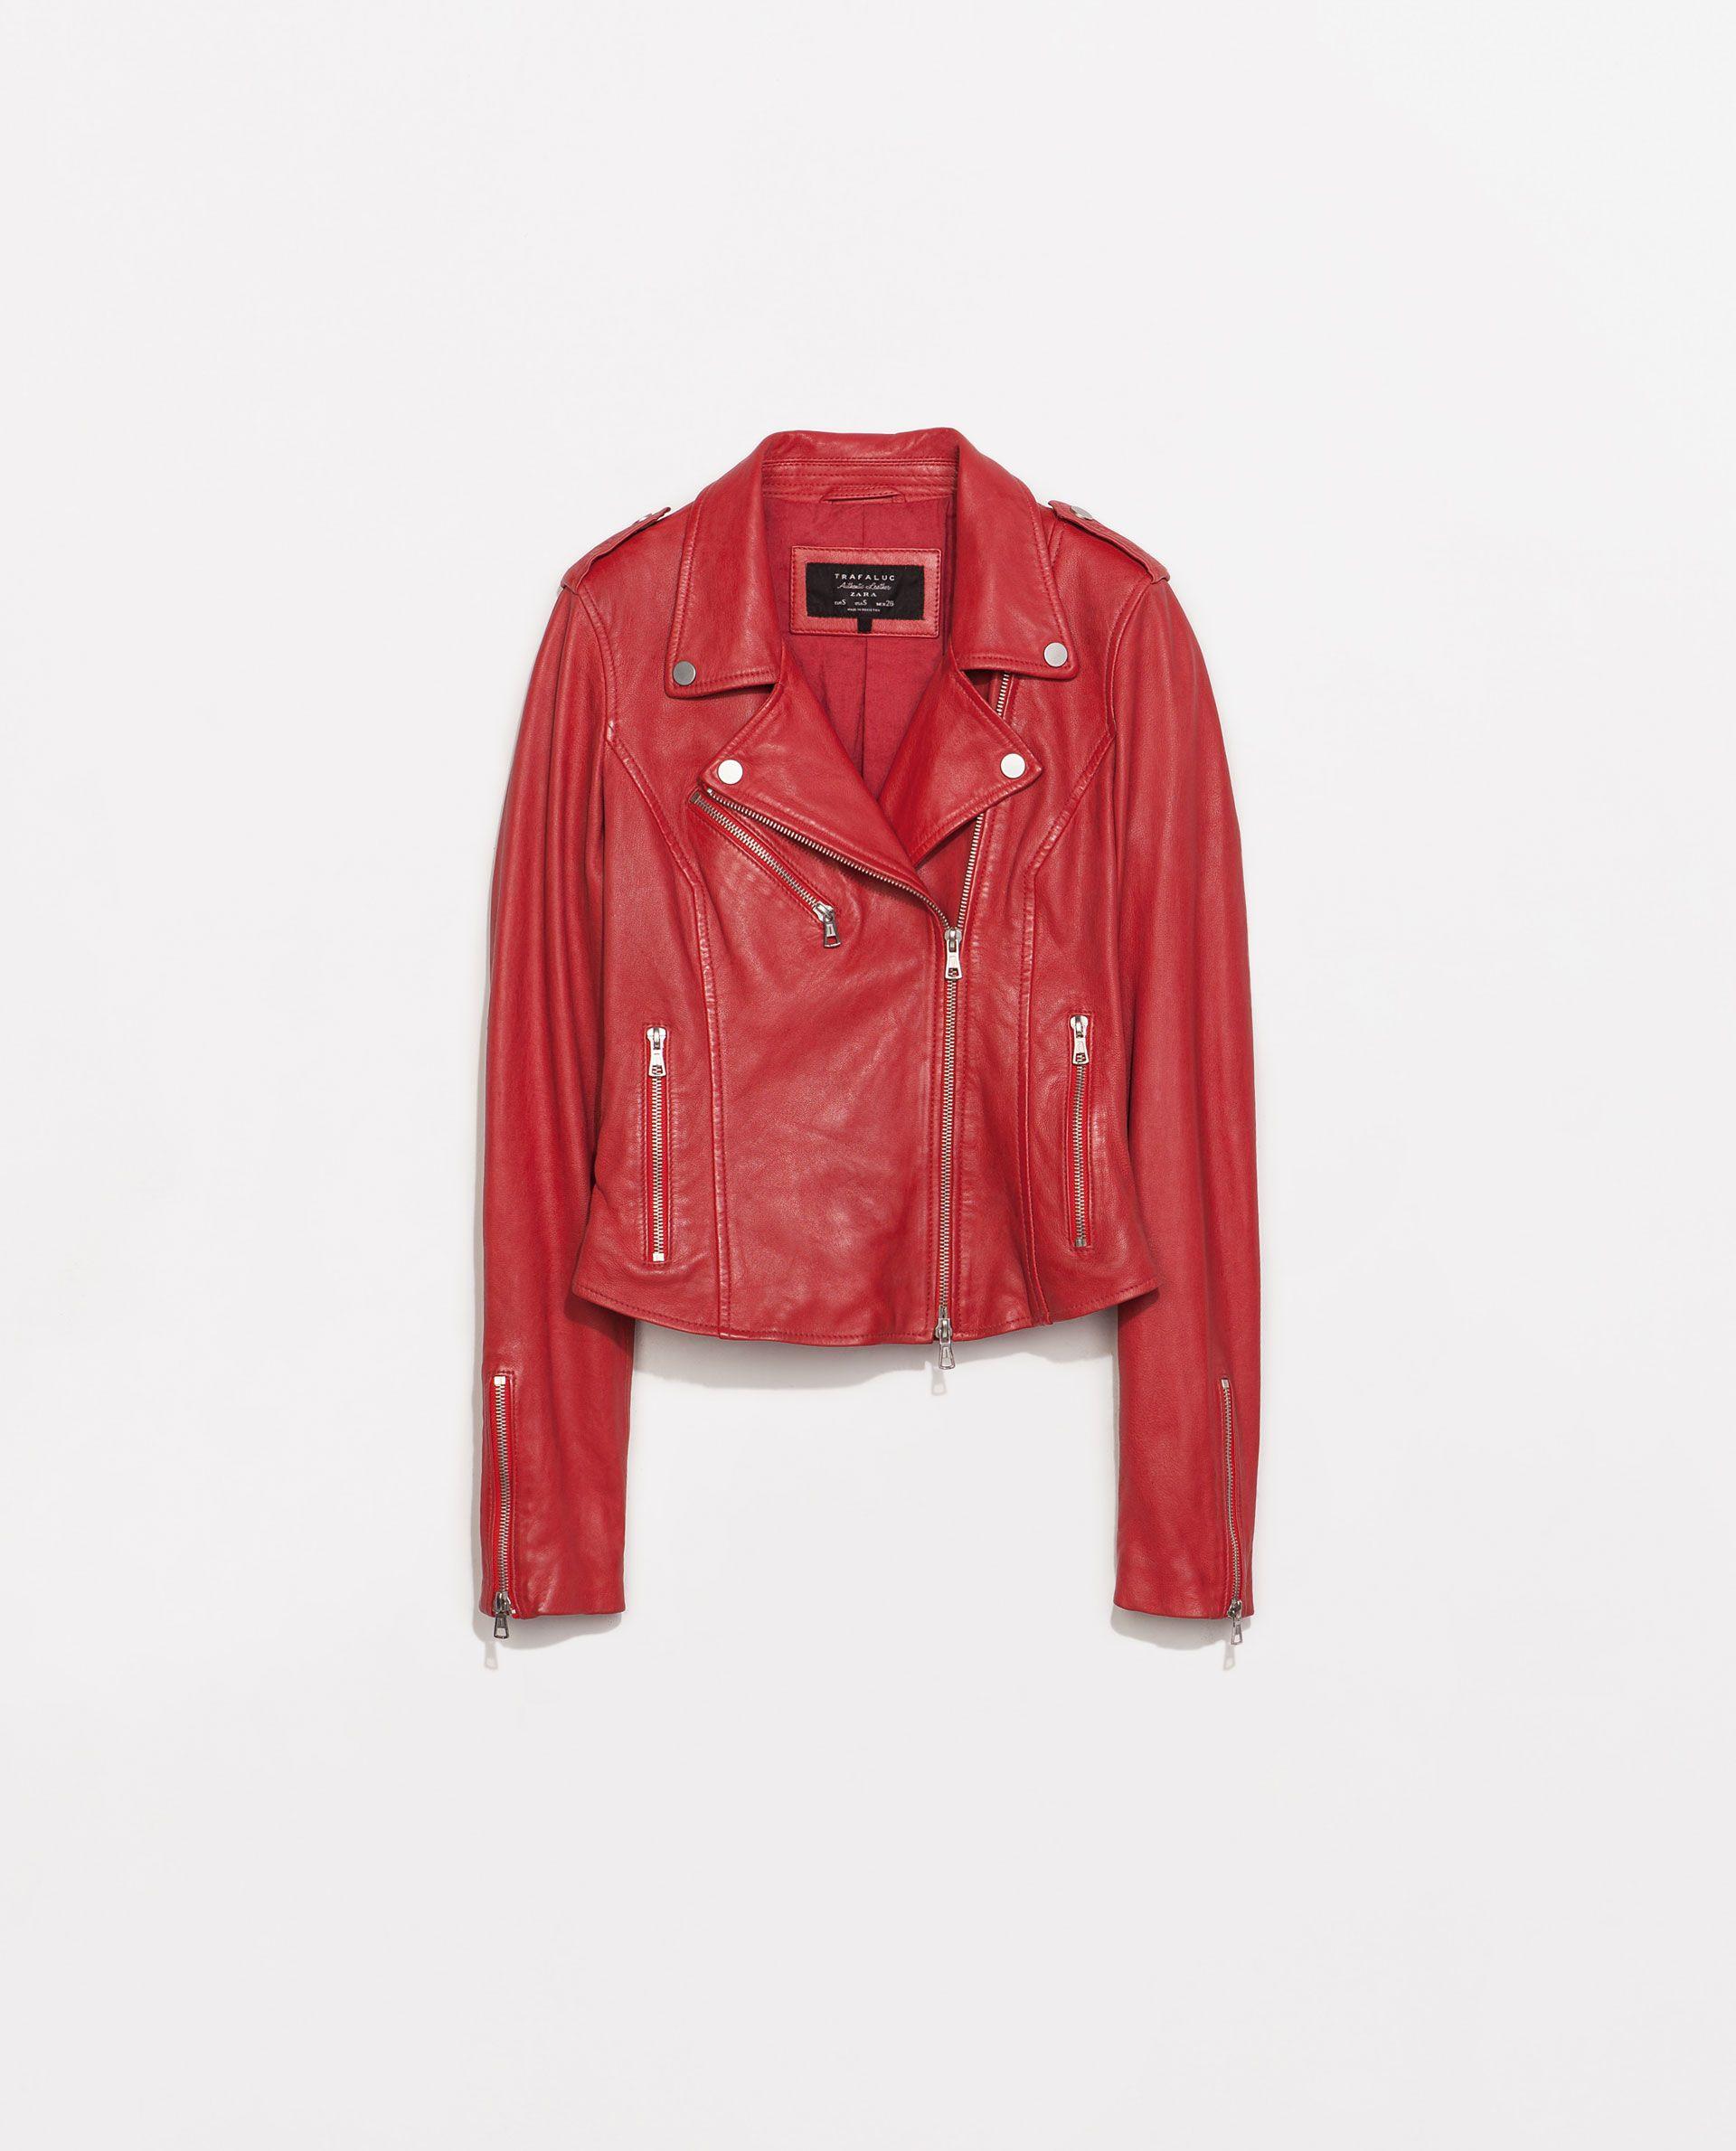 Chaqueta 65asqs Rojo Mujer Zara Cuero Pxfrzqw rRgYqr